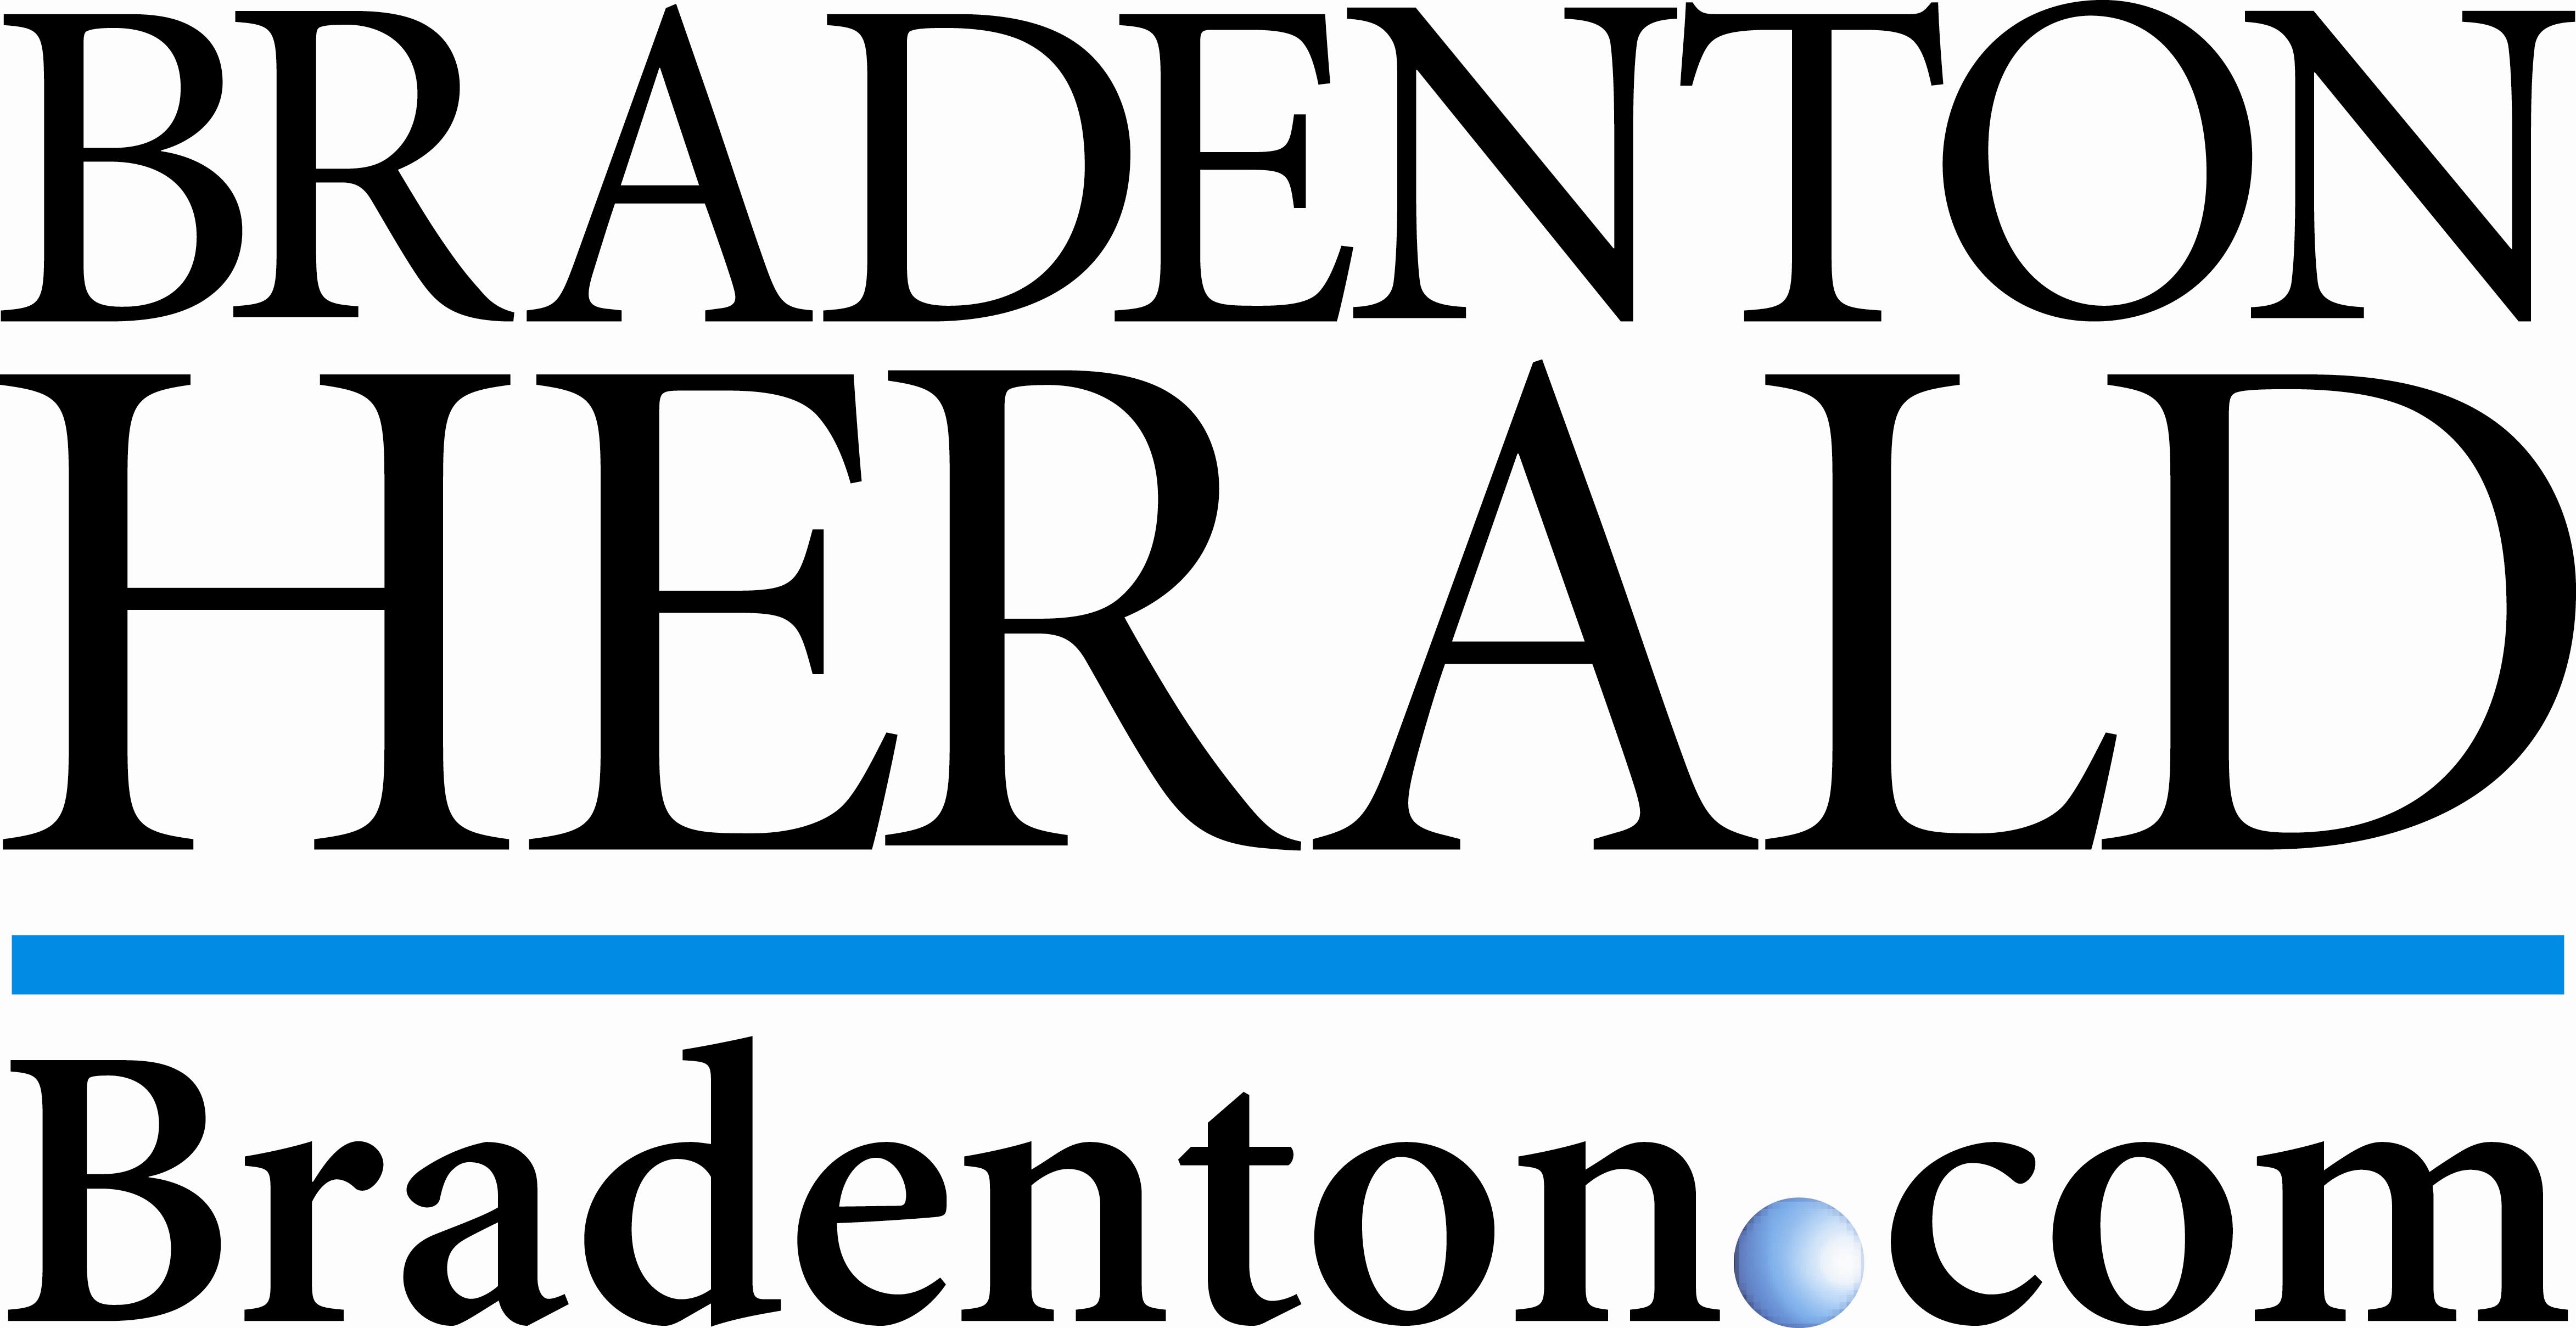 Bradenton-Herald-logo